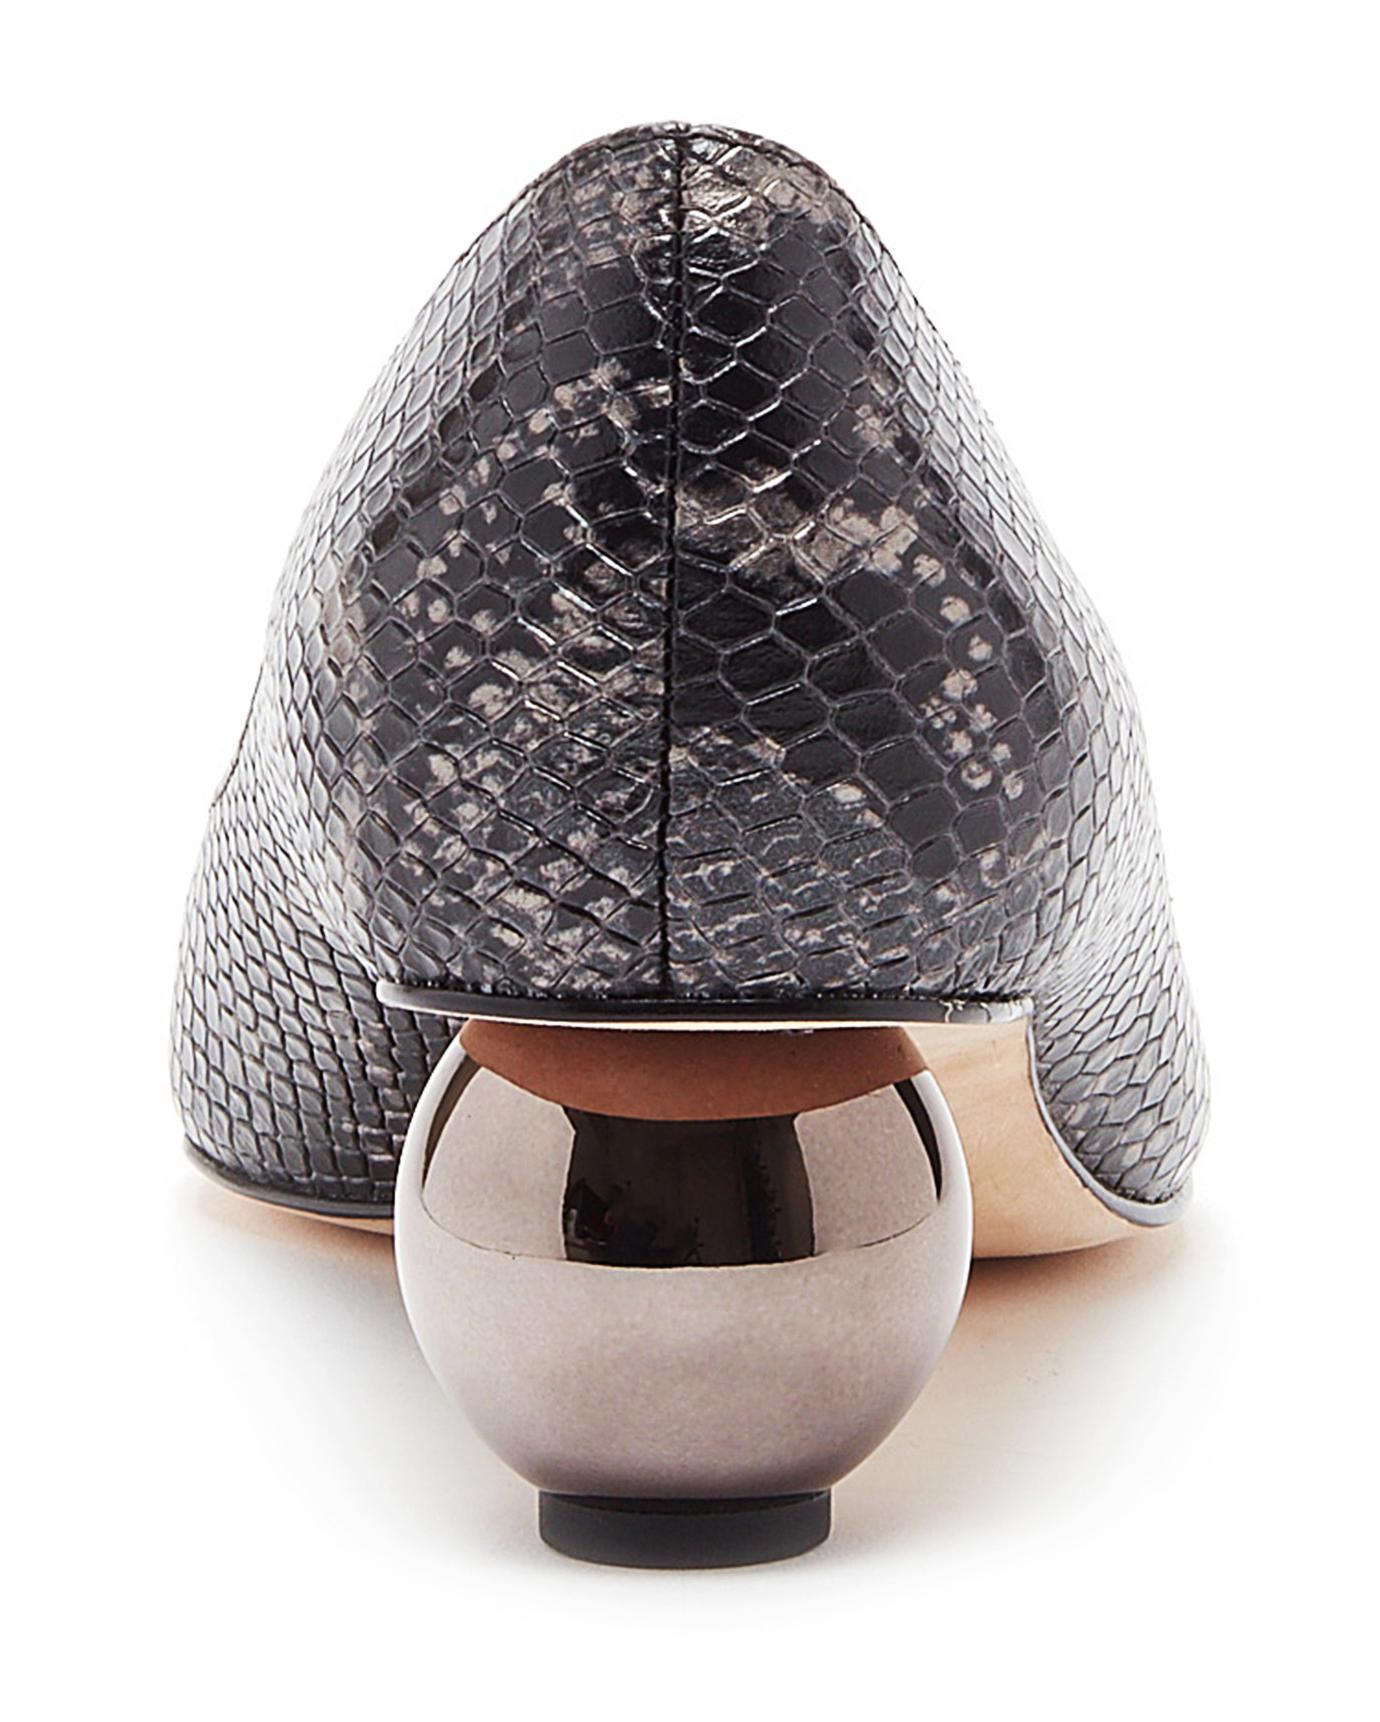 Pour La Victoire Victoire Victoire Kiki Suede Sphere Heel Pump, Nickel Pointed Toe Pump 4164ef